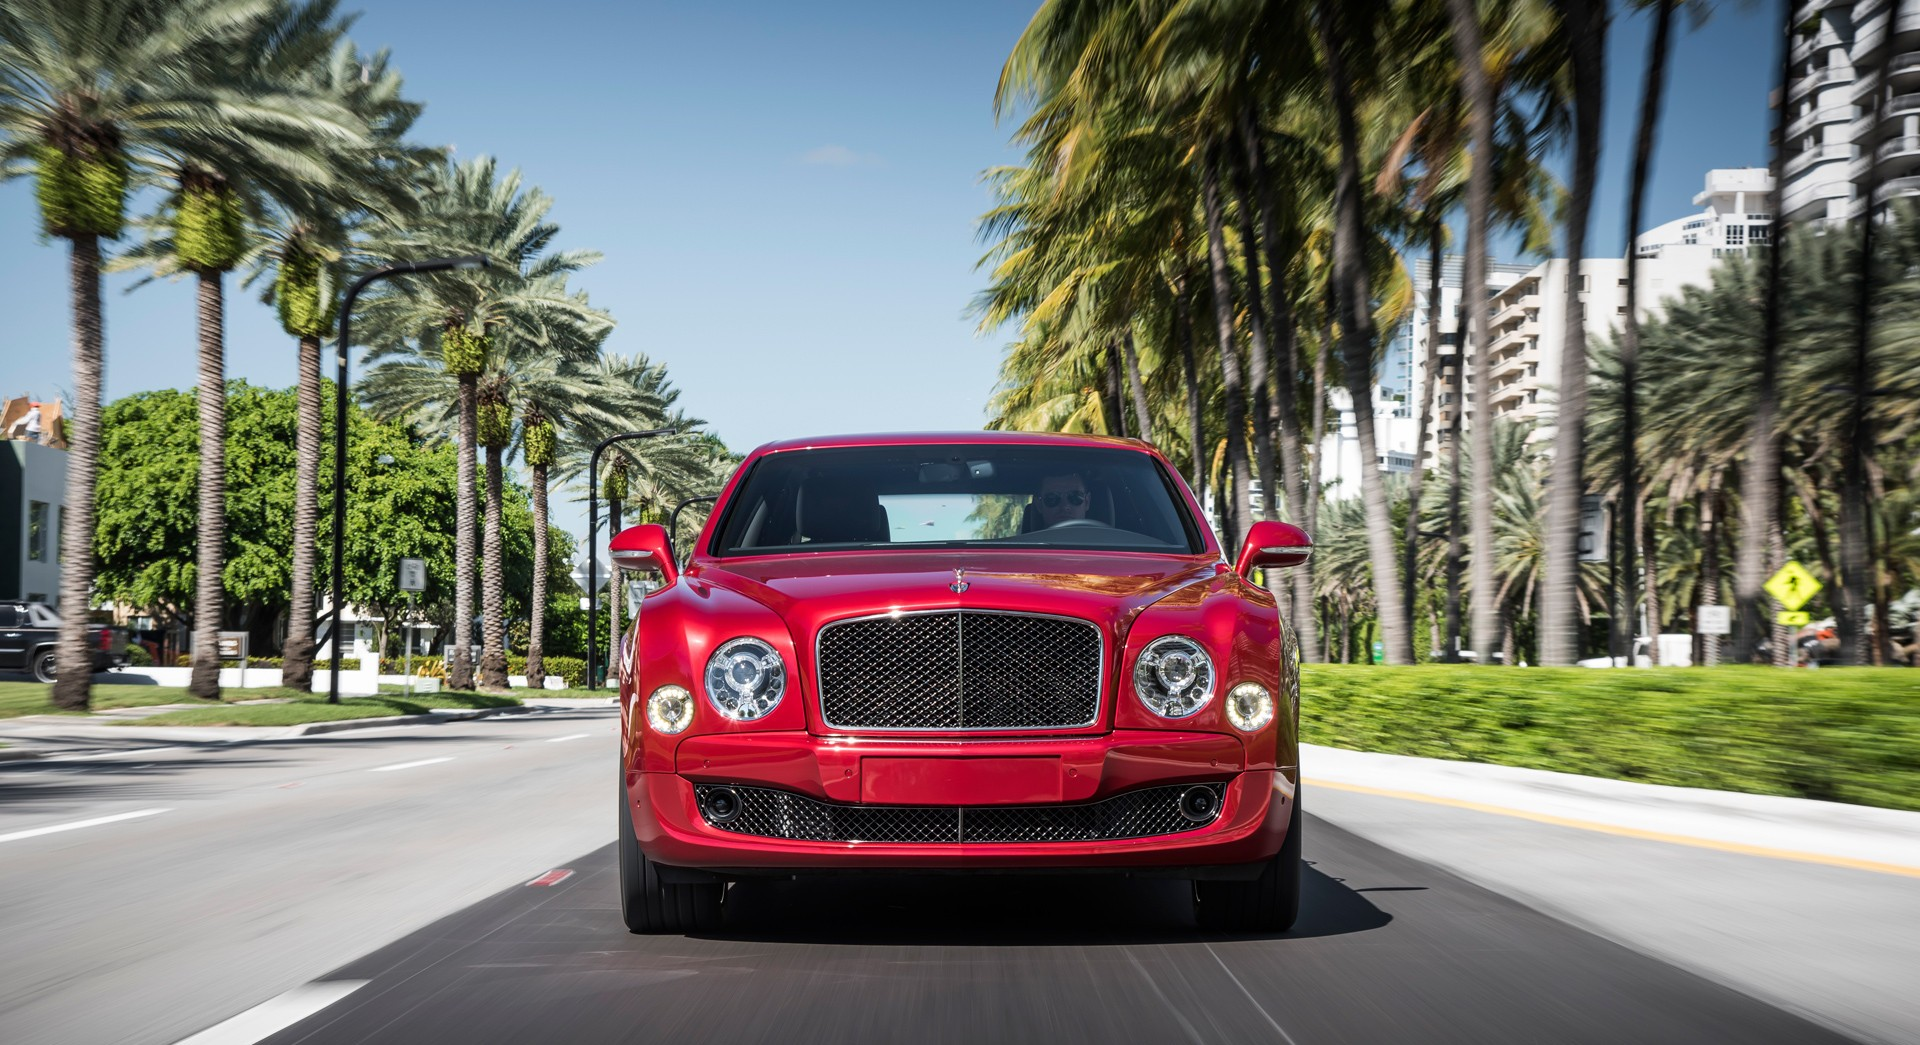 bentley mulsanne red cool car